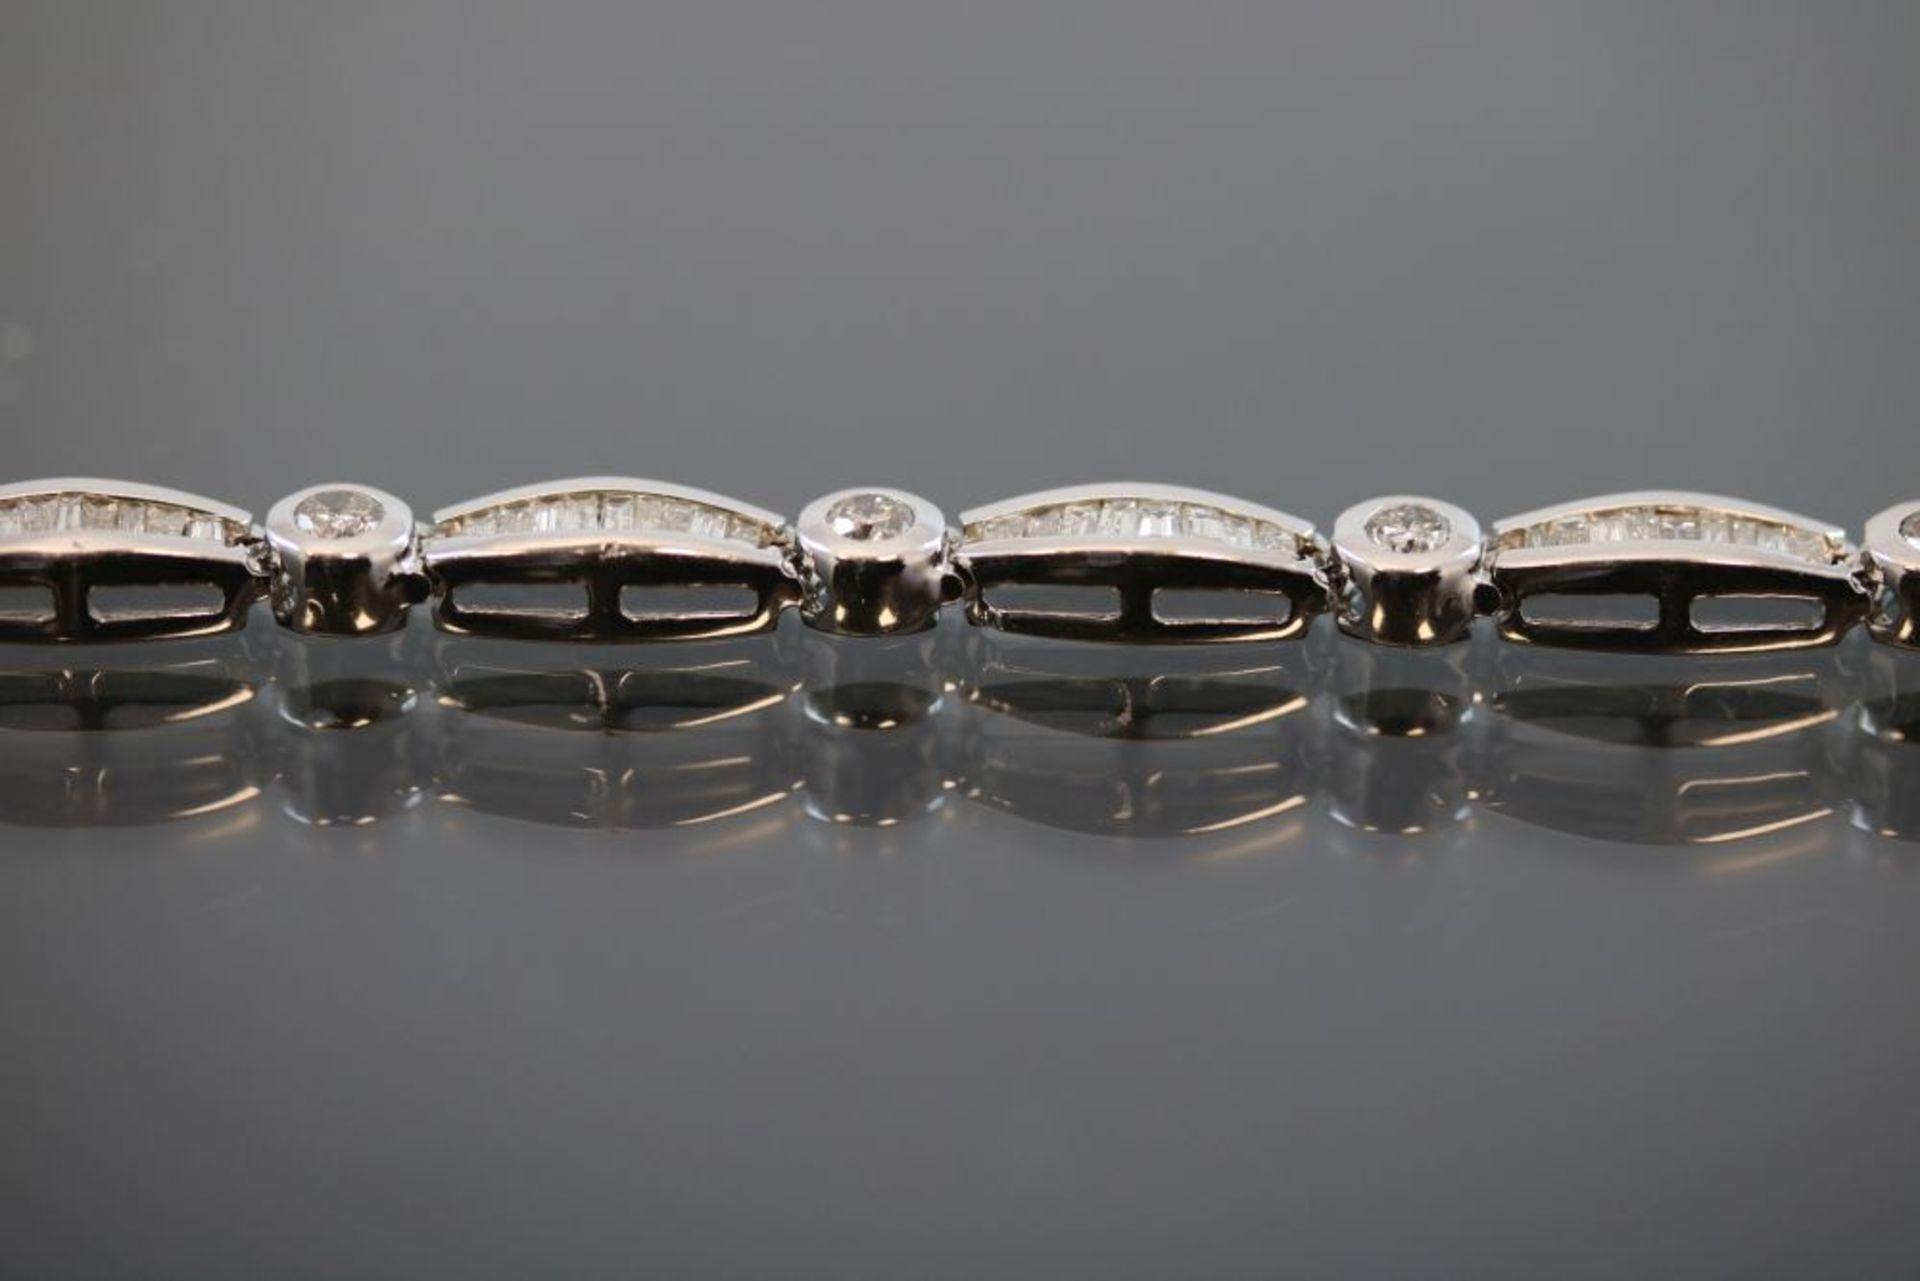 Brillant-Diamant-Armband, 750 Weißgold - Image 3 of 3